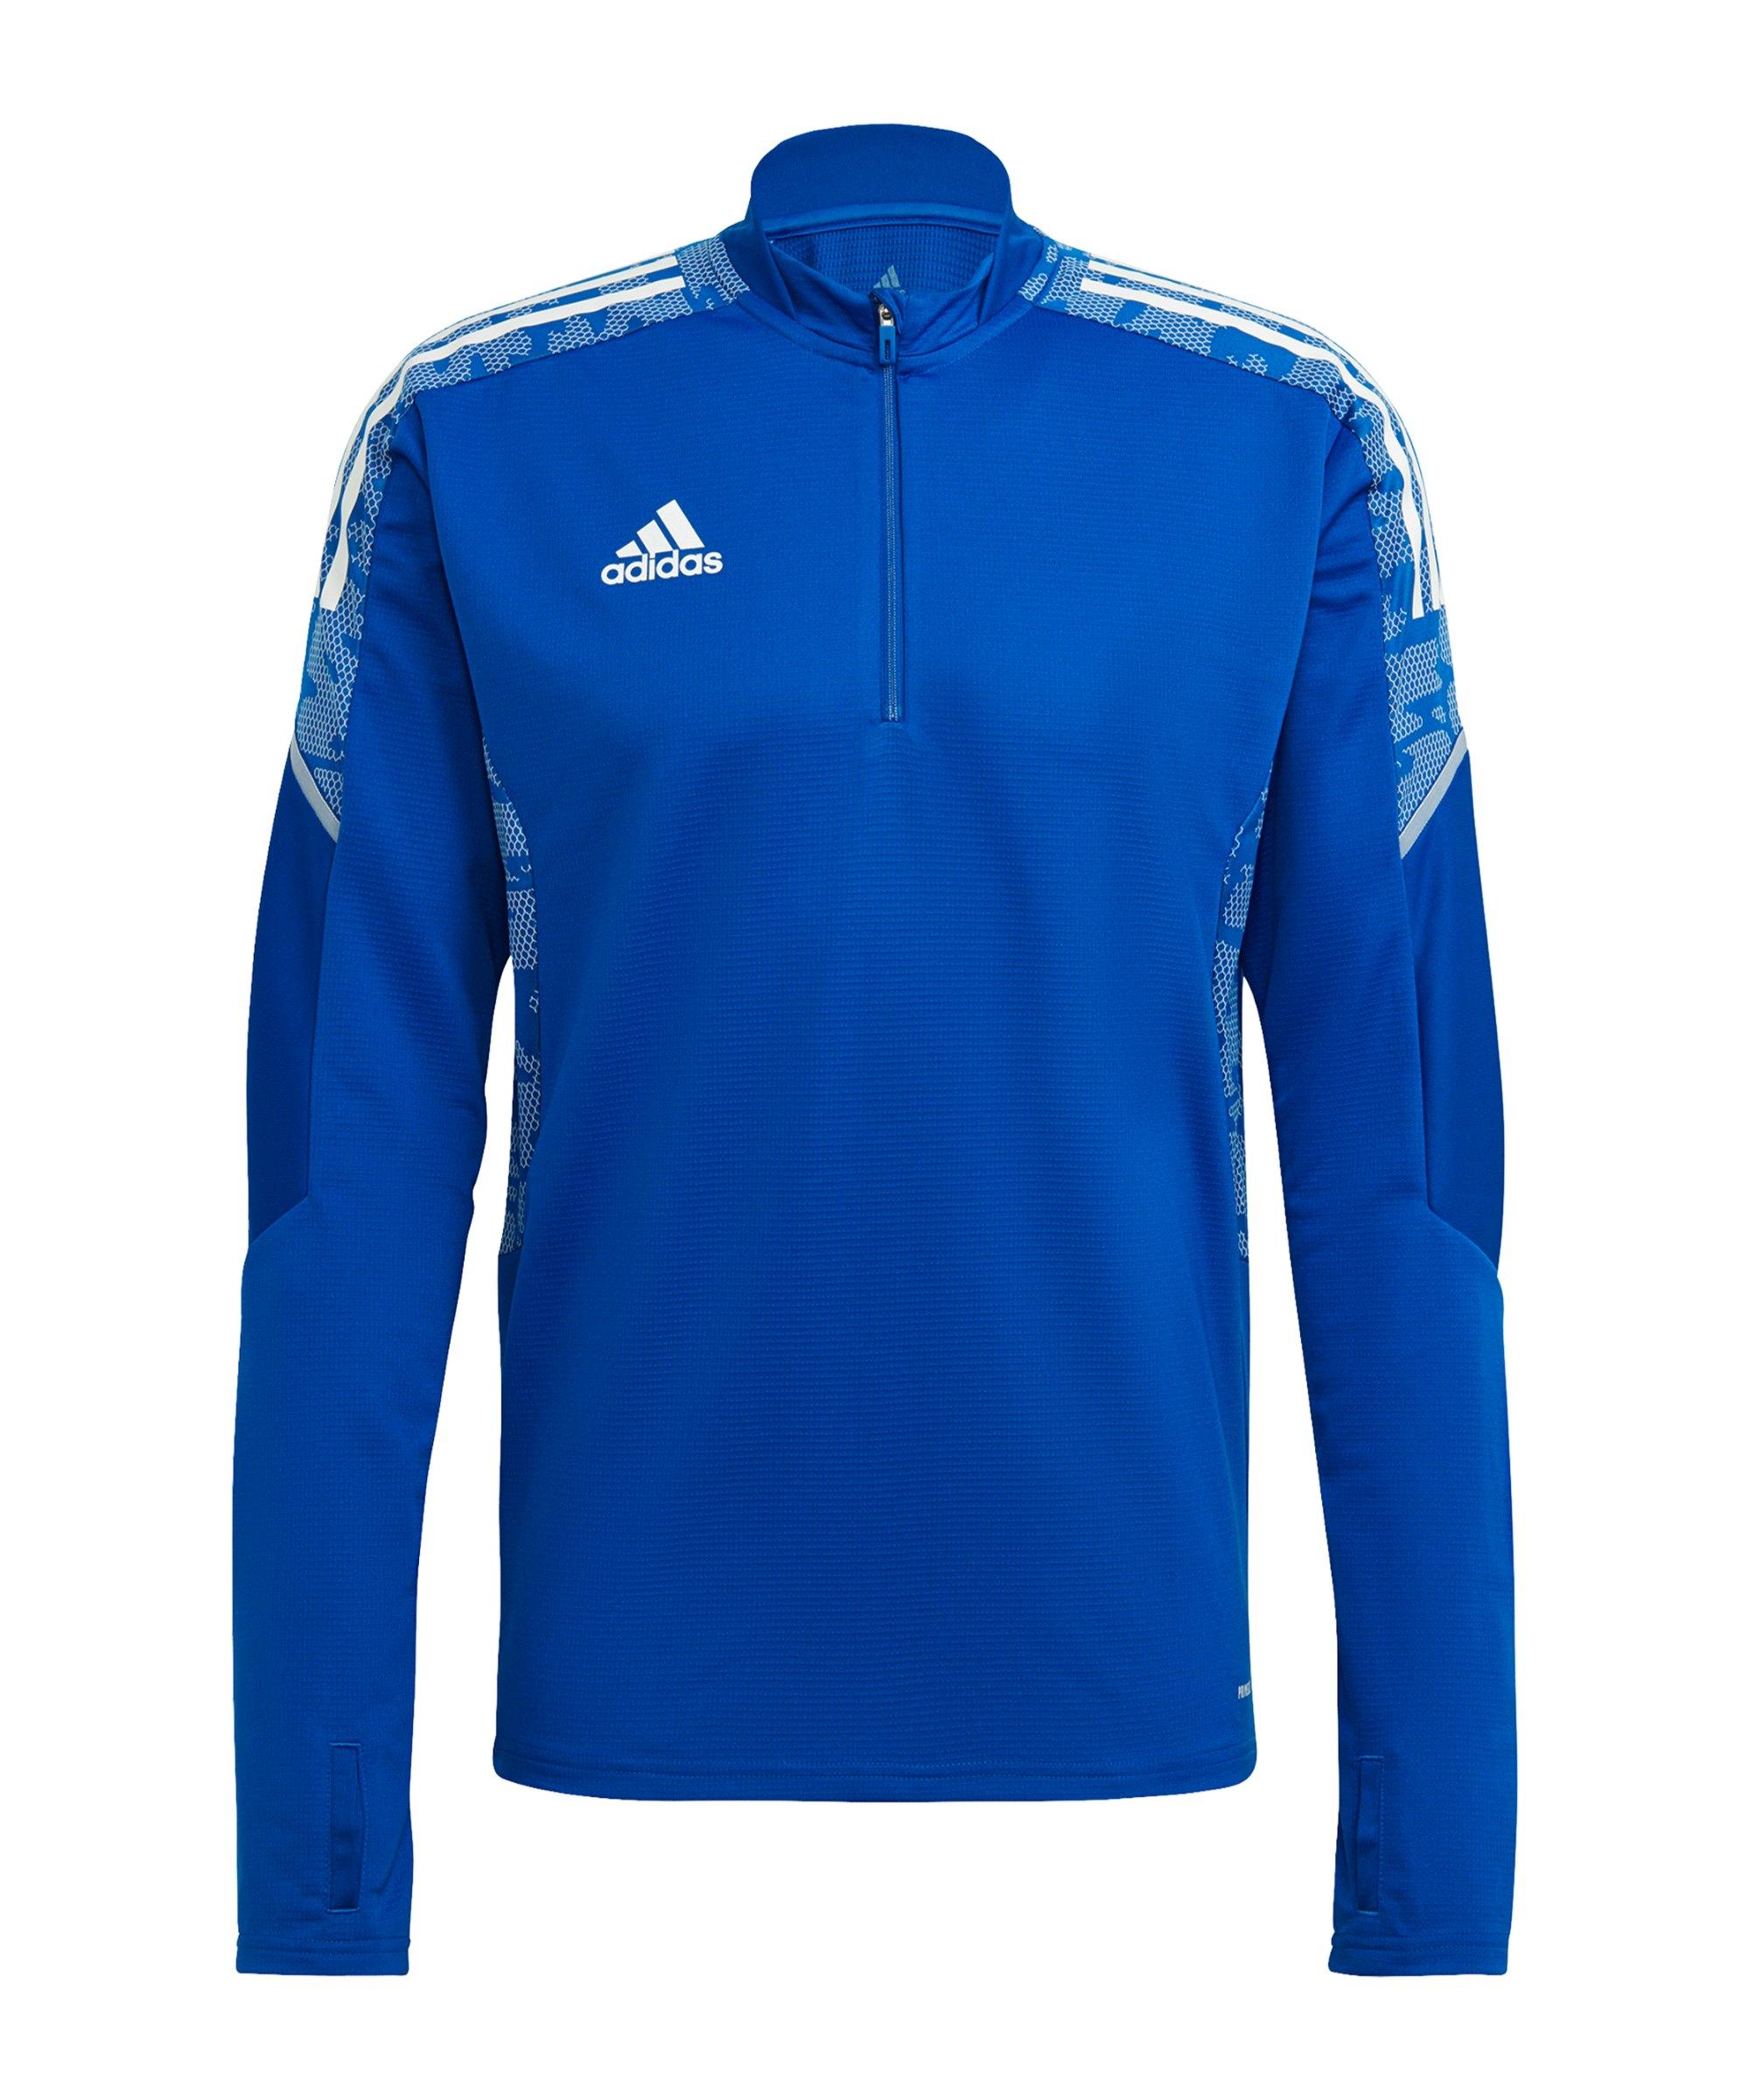 adidas Condivo 21 Trainingstop Blau Weiss - blau